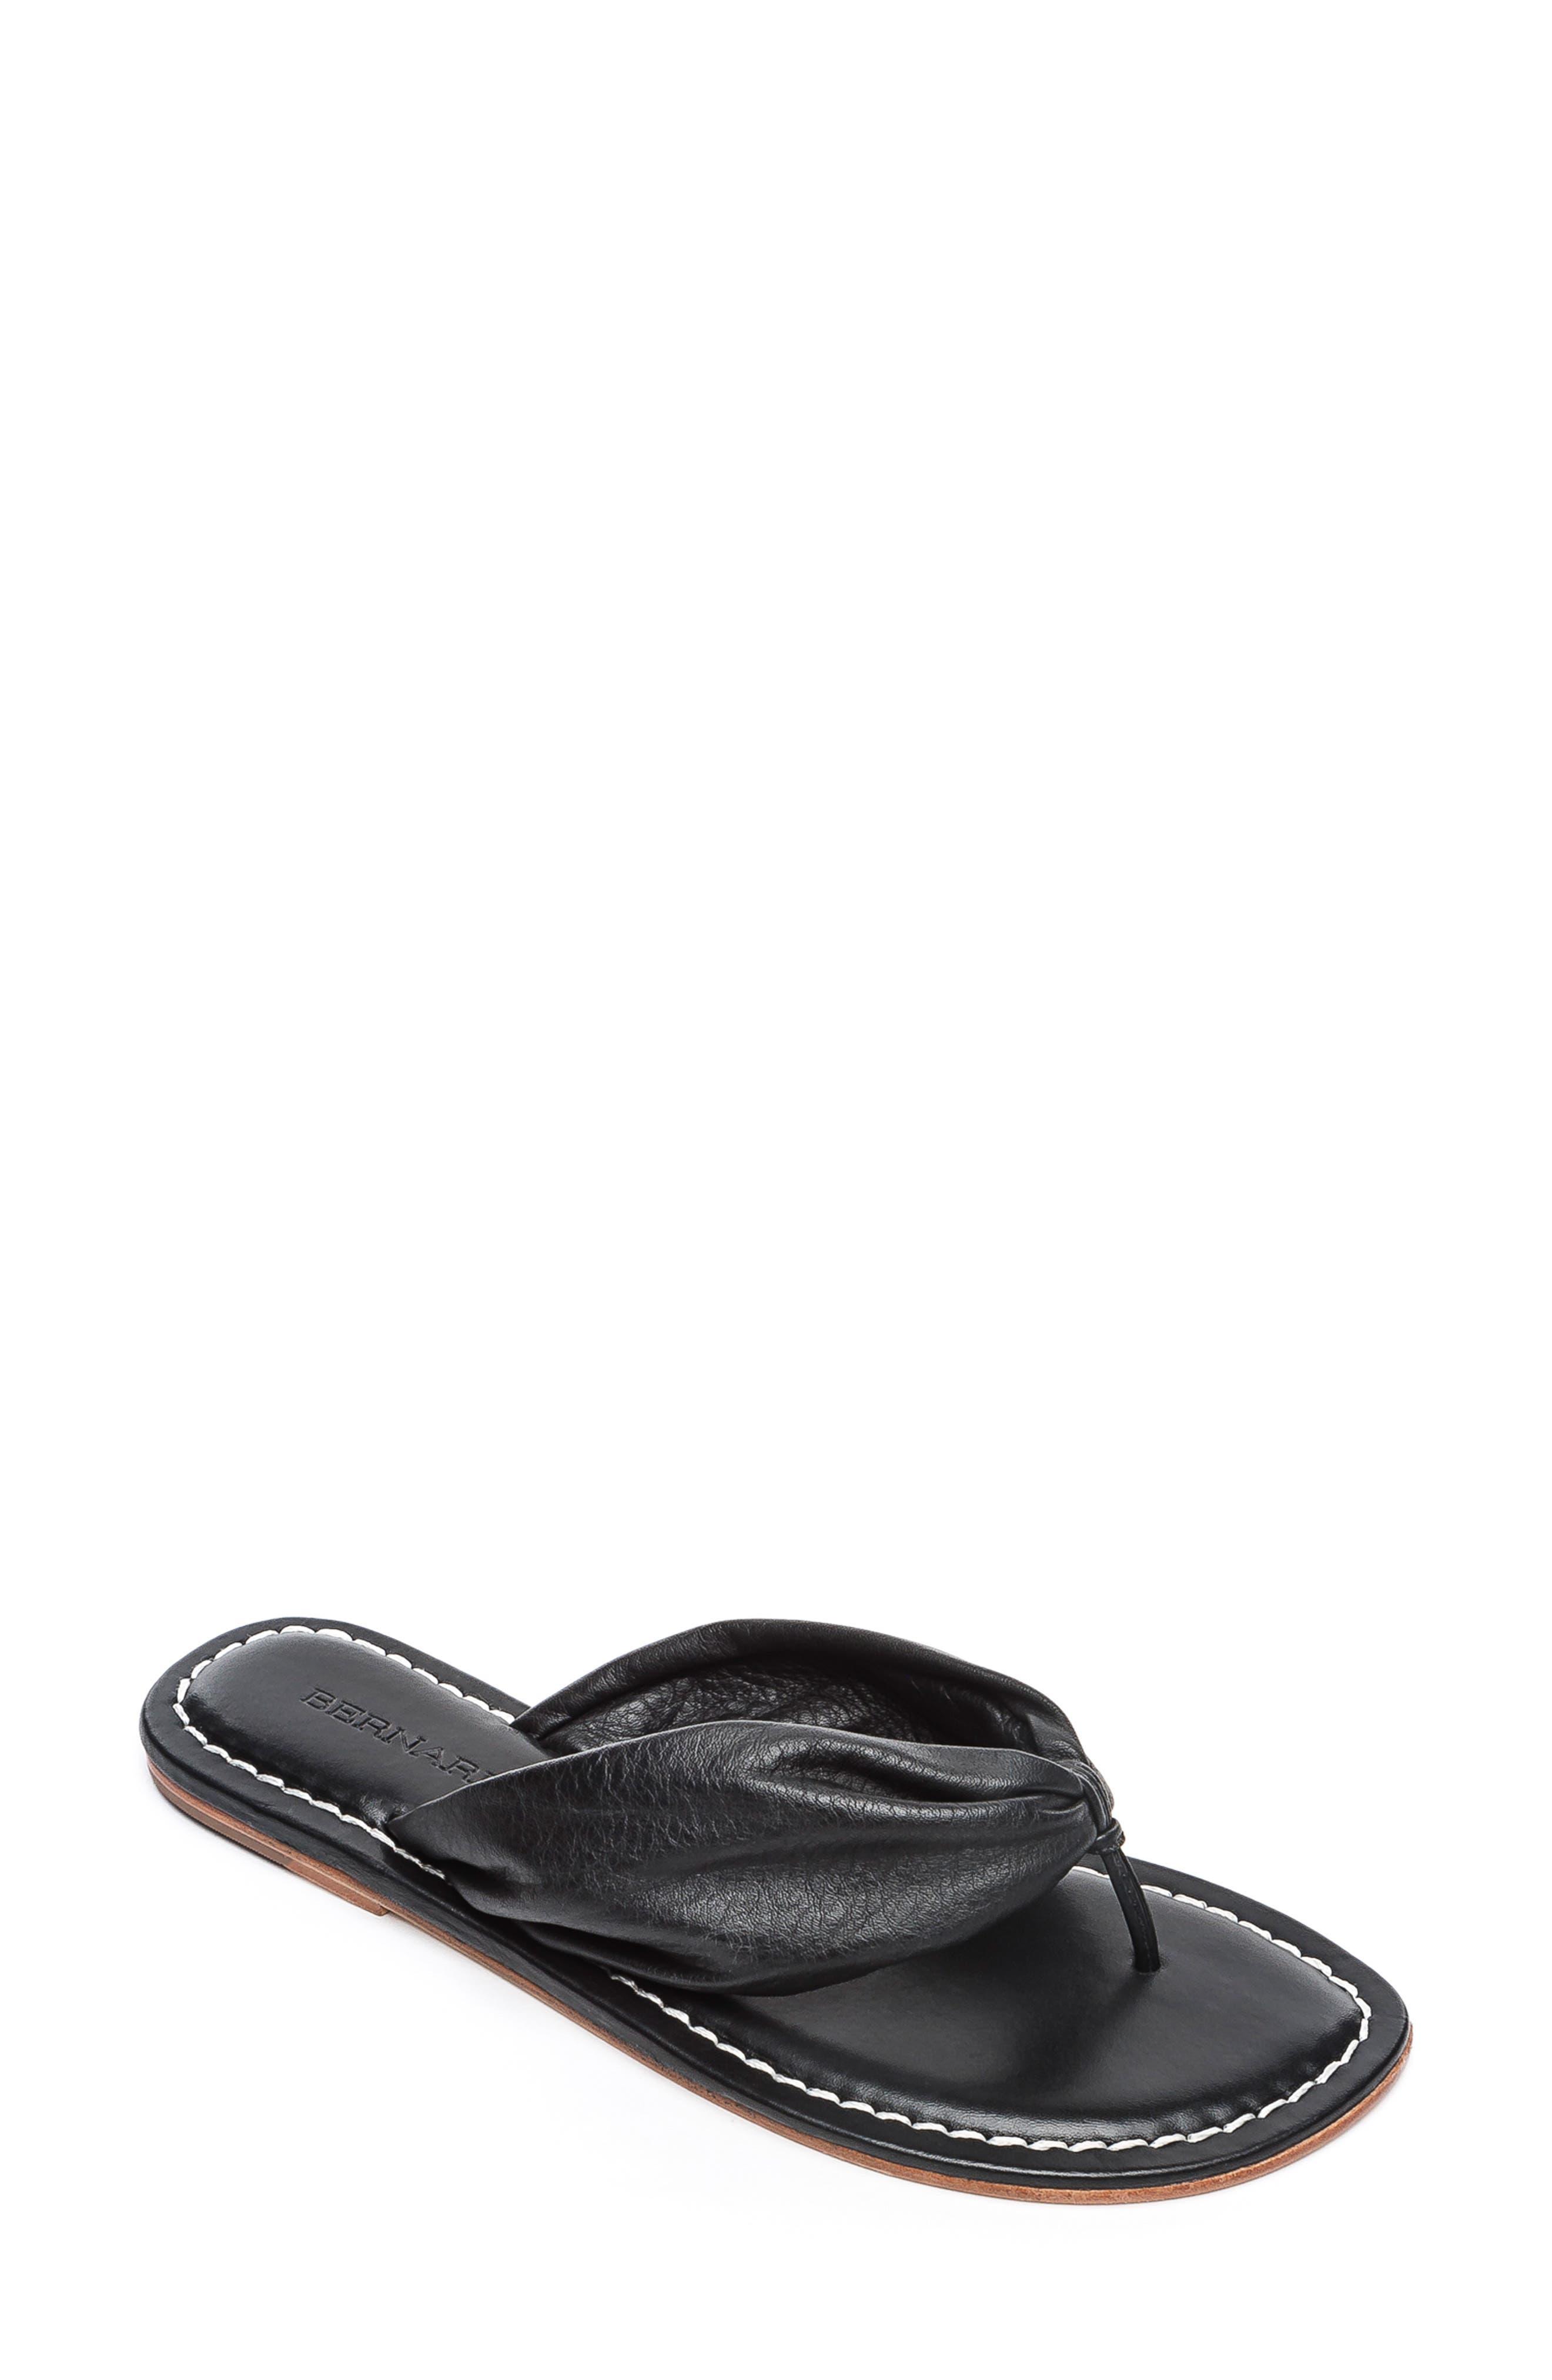 BERNARDO Mila Flip Flop, Main, color, BLACK